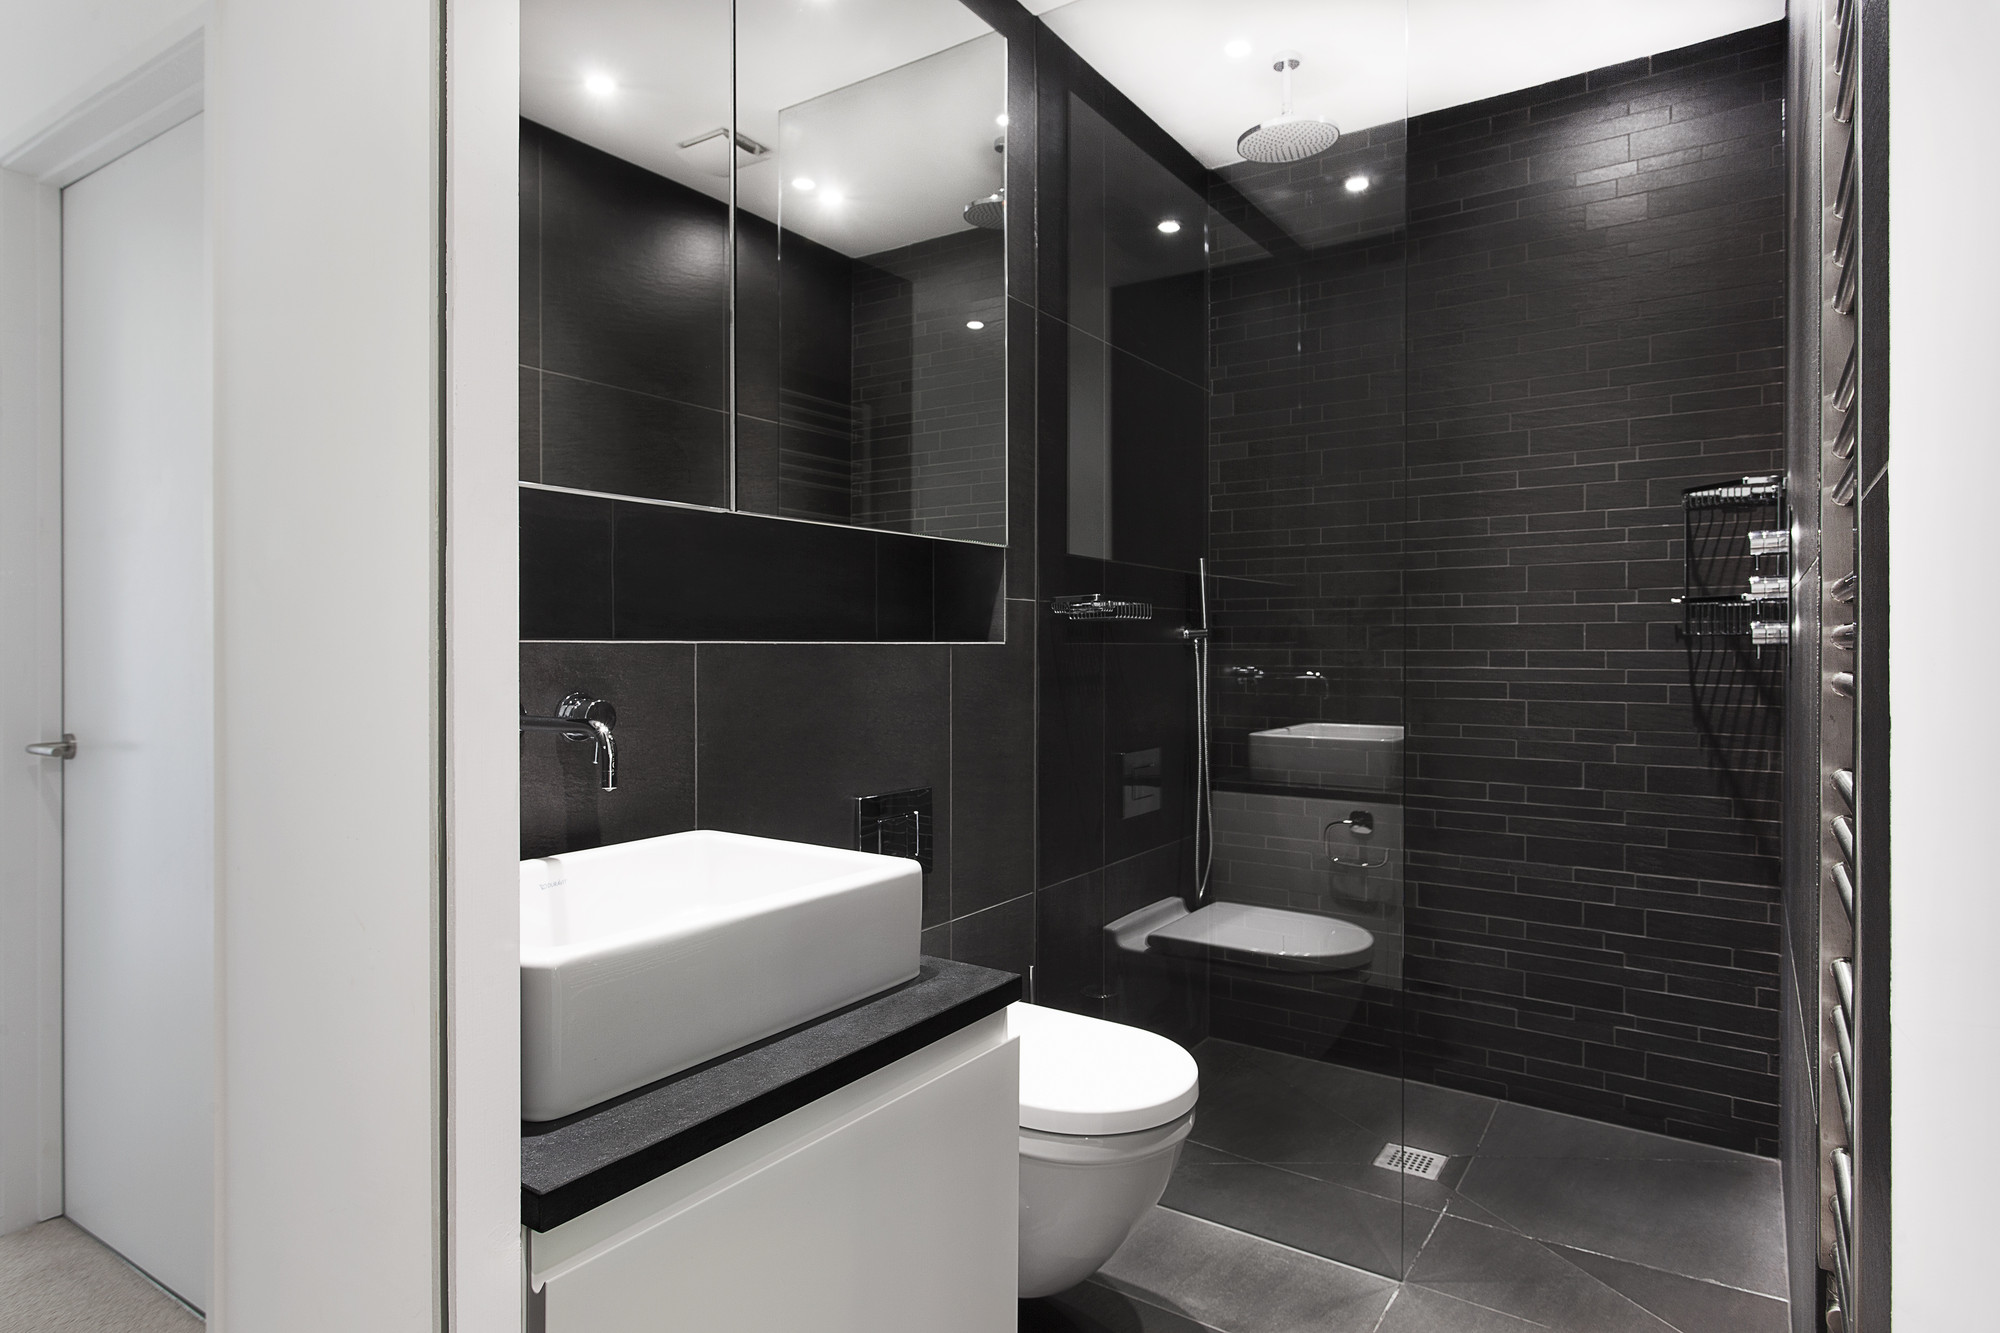 Gallery of the medic 39 s house ar design studio 5 for Bathroom design 2x2